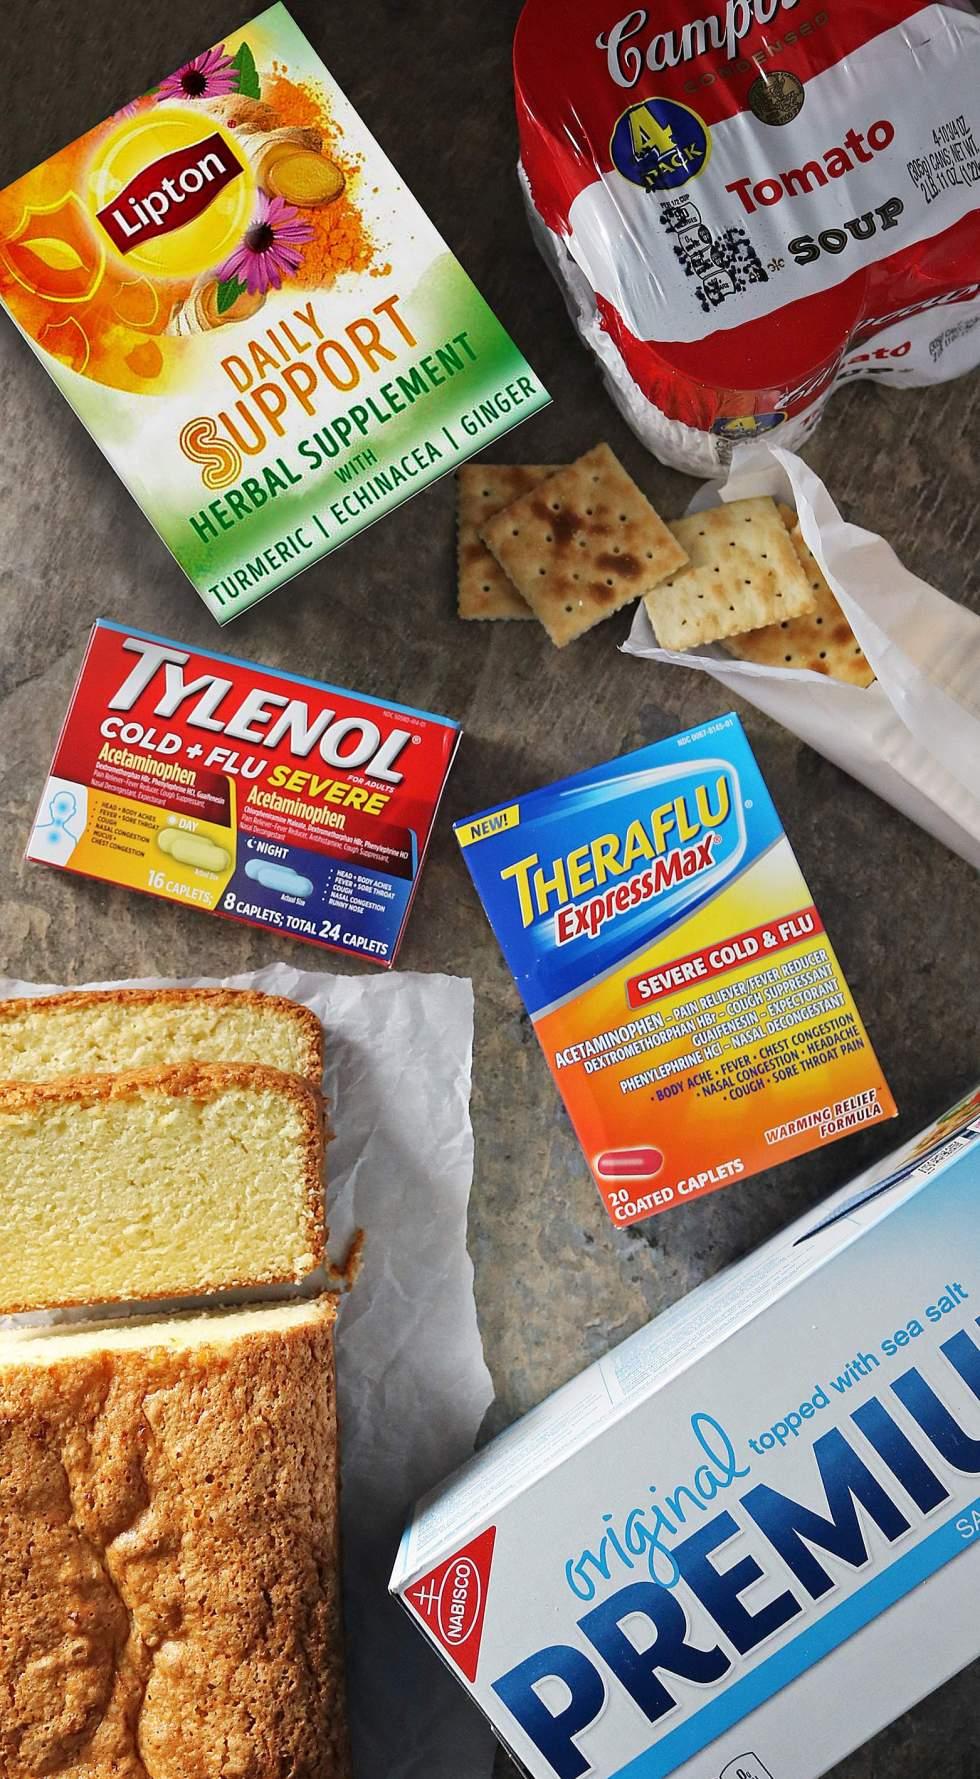 Easy Orange Ginger Loaf, Campbell's®, Lipton, Premium Crackers, Theraflu, TYLENOL®, #SickDaSolutions